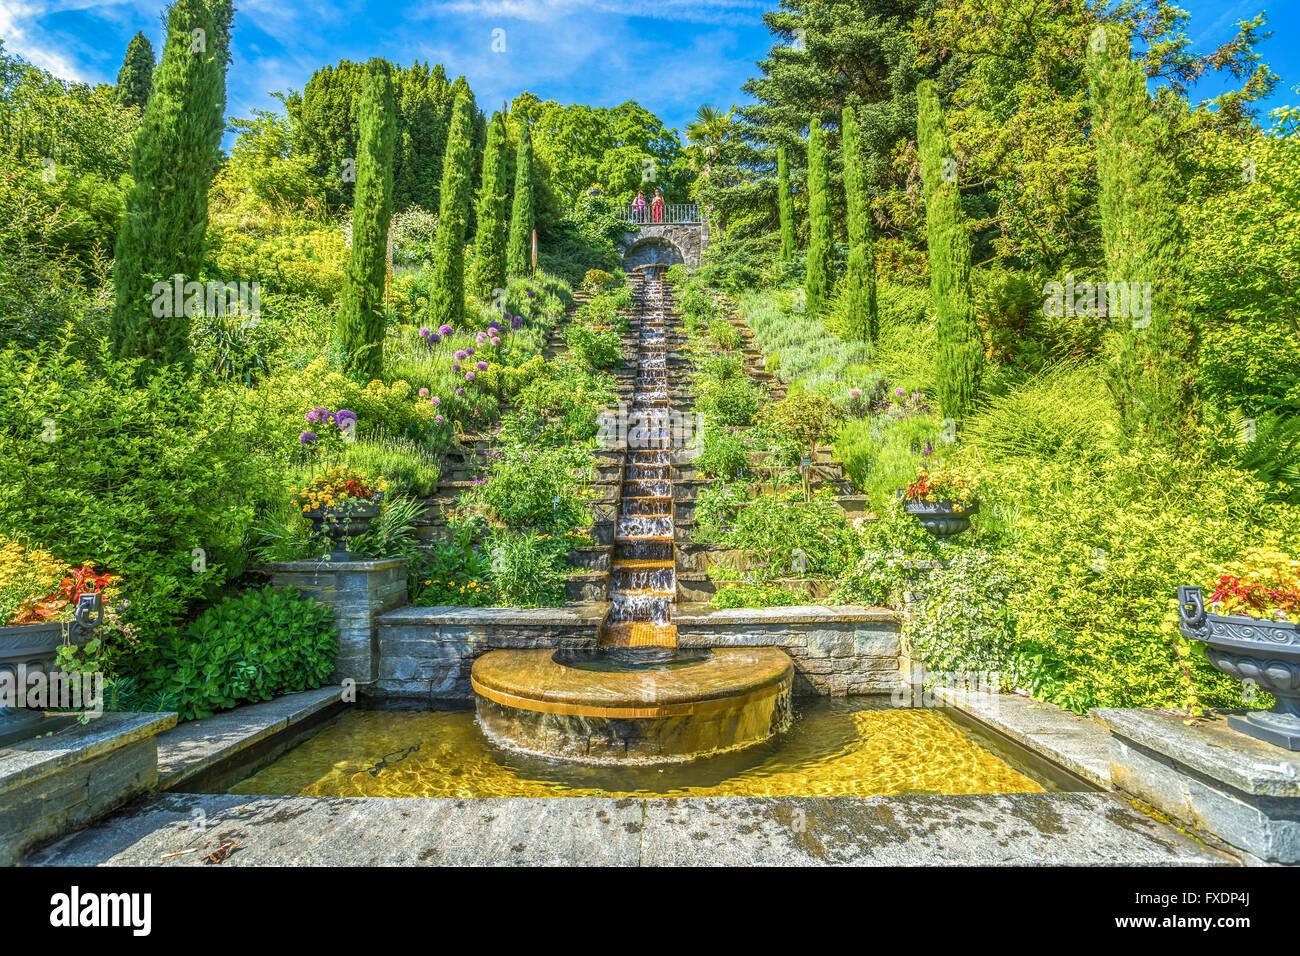 Italienische Wassertreppe, Insel Mainau - Stock Image